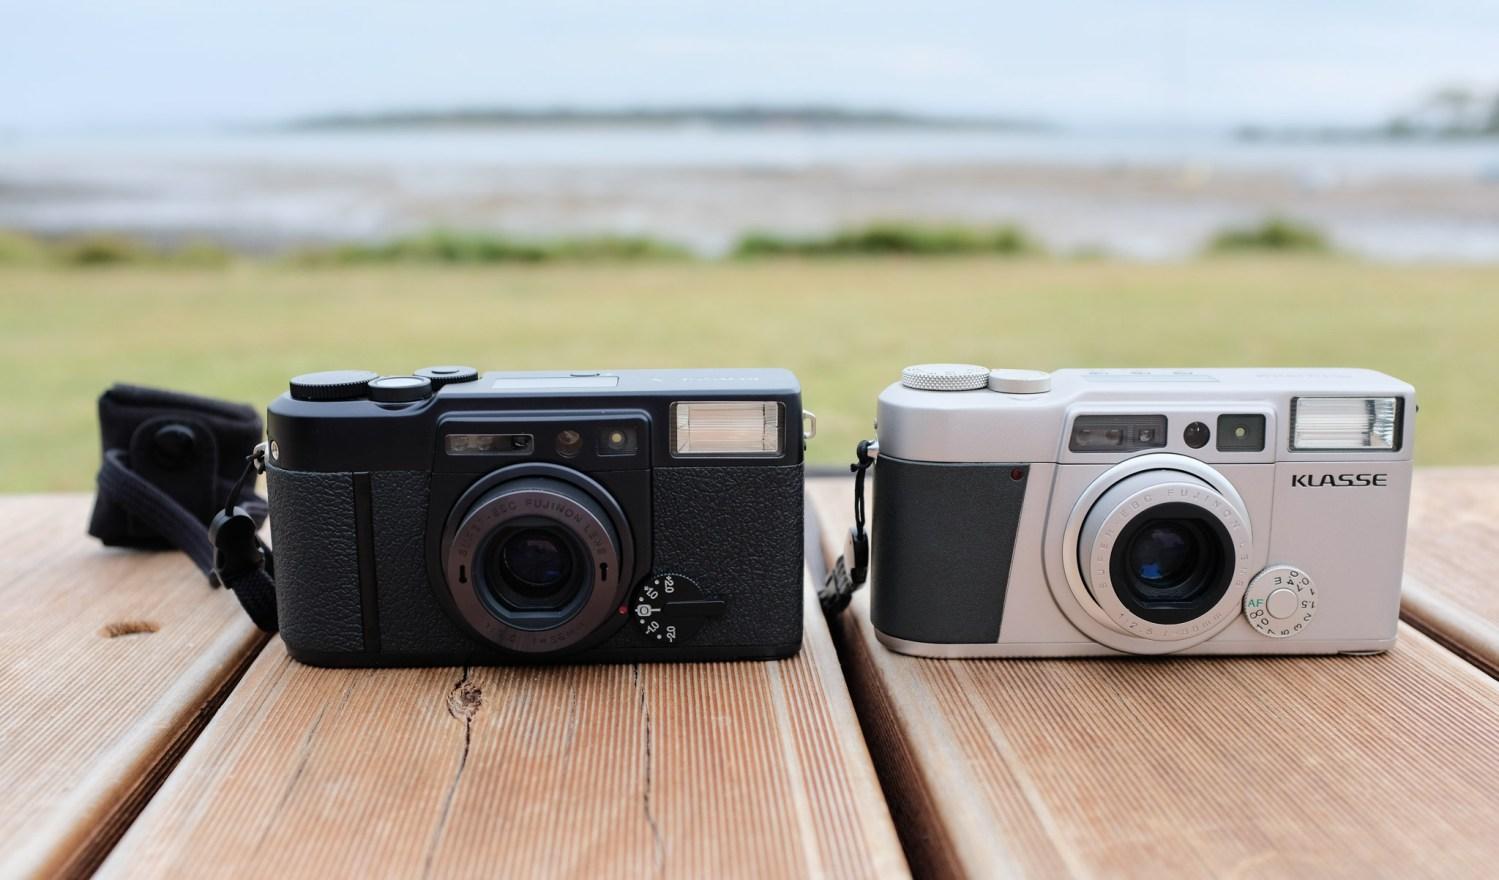 Fujifilm Klasse vs Fujifilm Klasse S: two premium compact